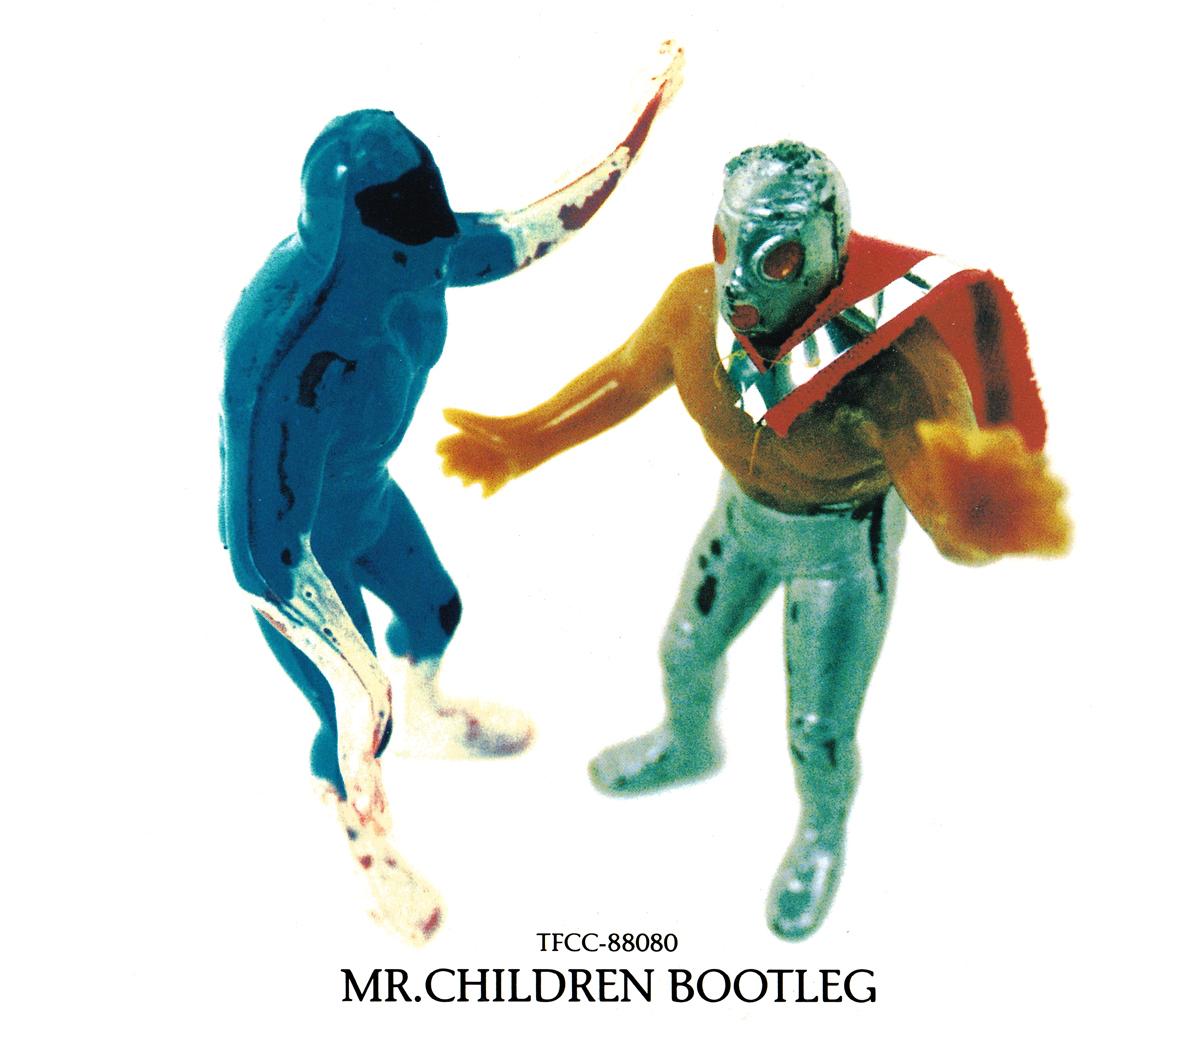 Mr.Children (ミスターチルドレン) 12thシングル『マシンガンをぶっ放せ -Mr.Children Bootleg-』(1996年8月8日) 高画質ジャケット画像